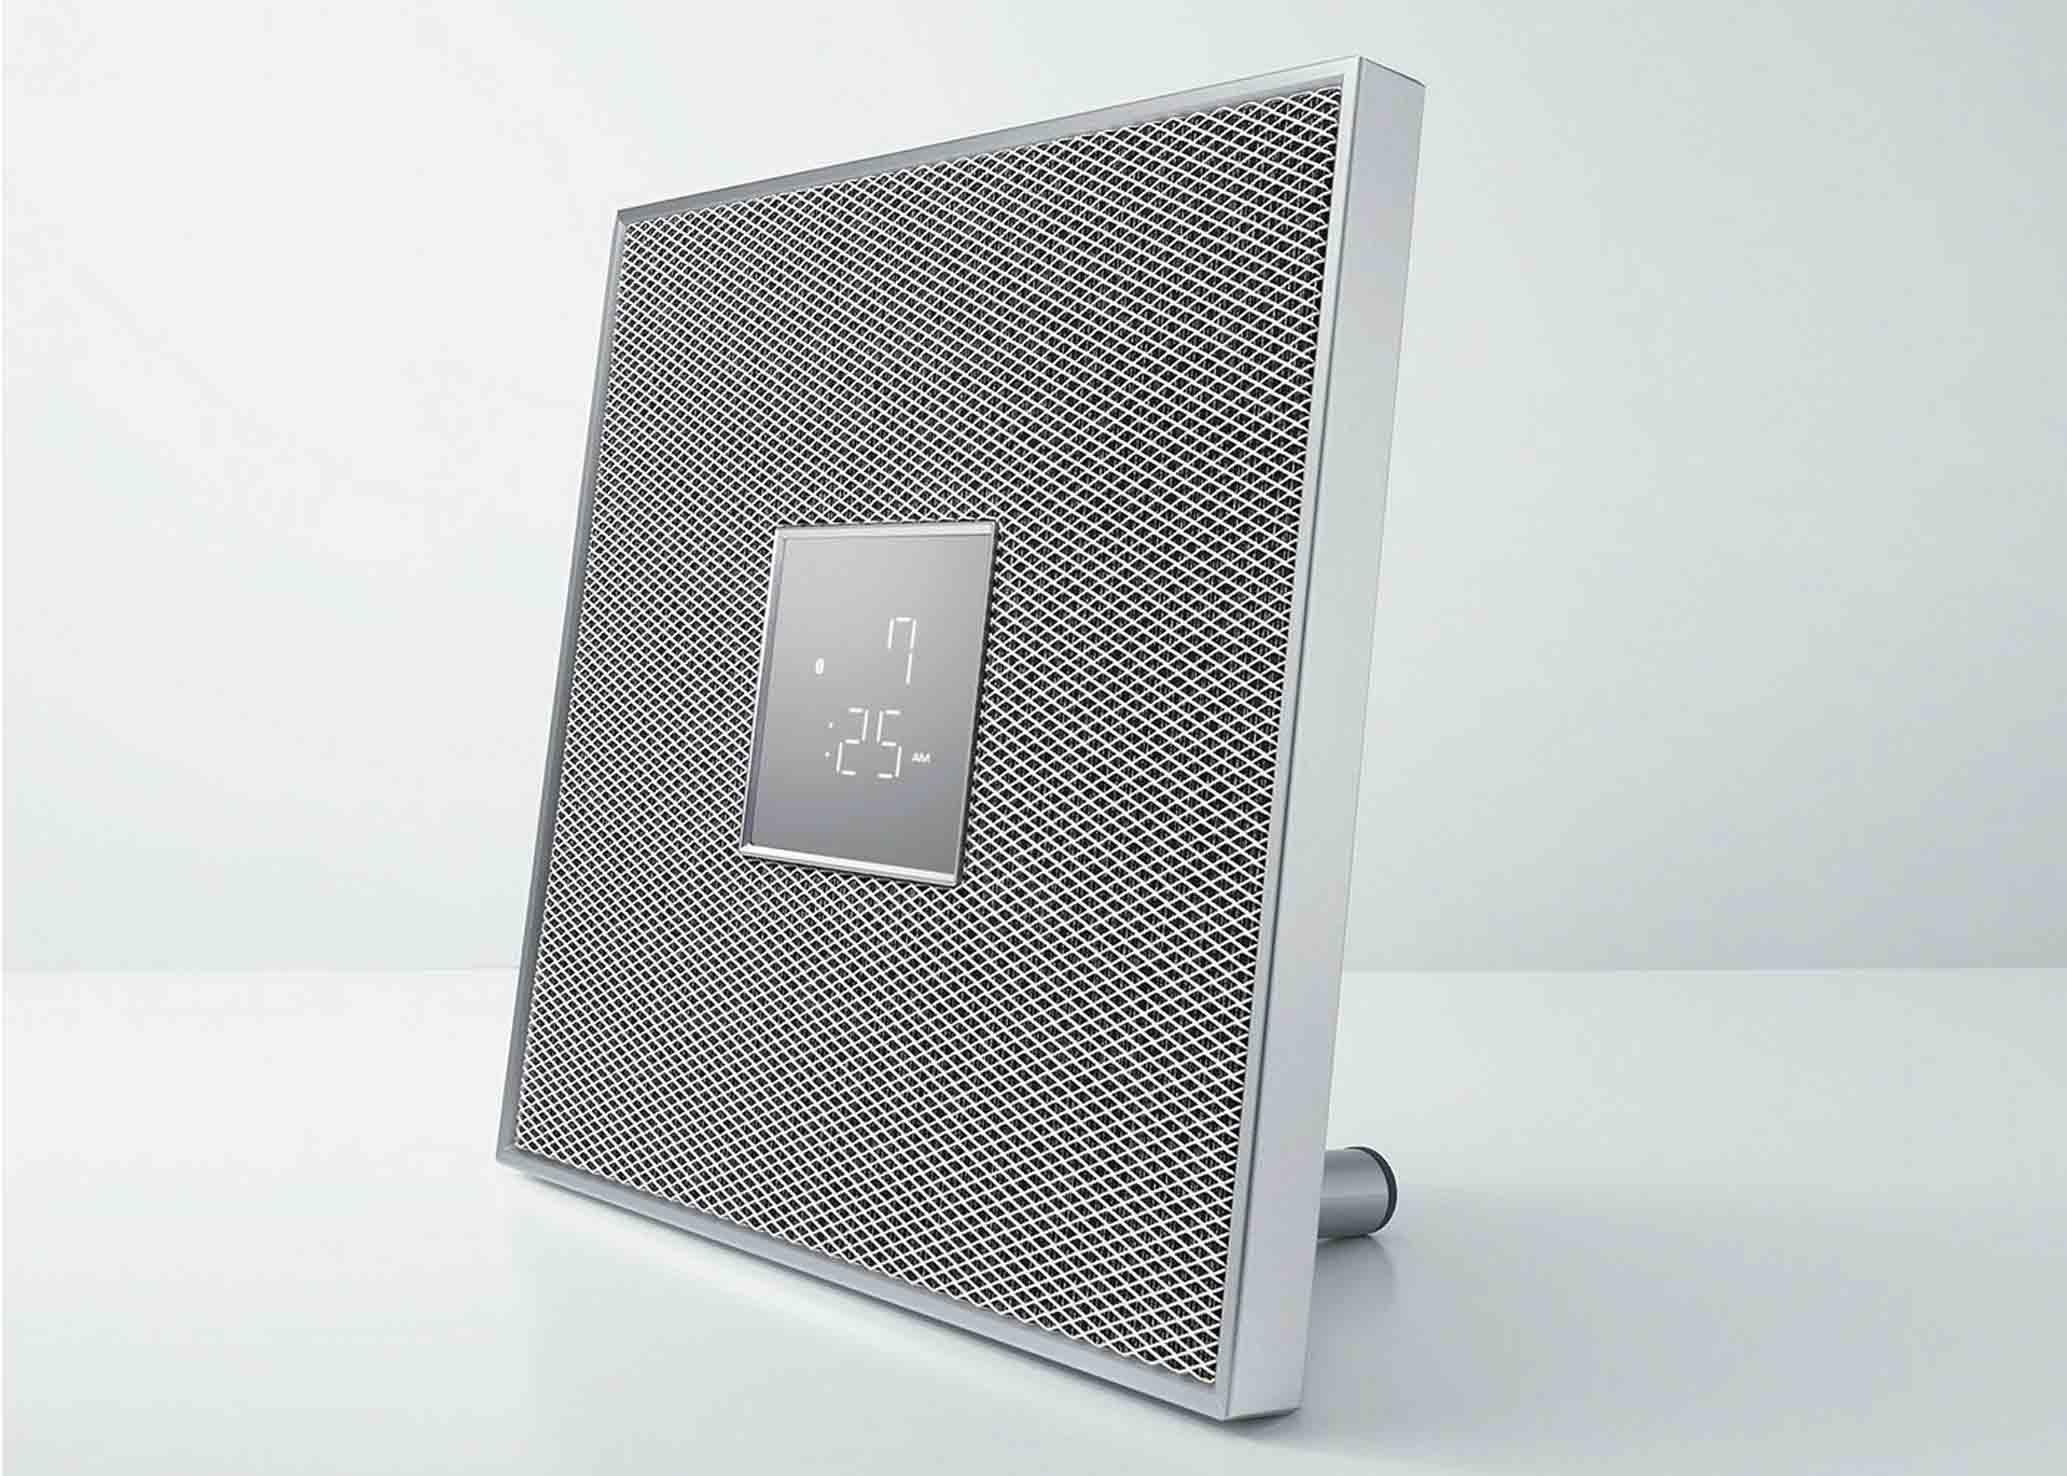 yamaha restio isx 80 musiccast integrated audio system white audio malta. Black Bedroom Furniture Sets. Home Design Ideas